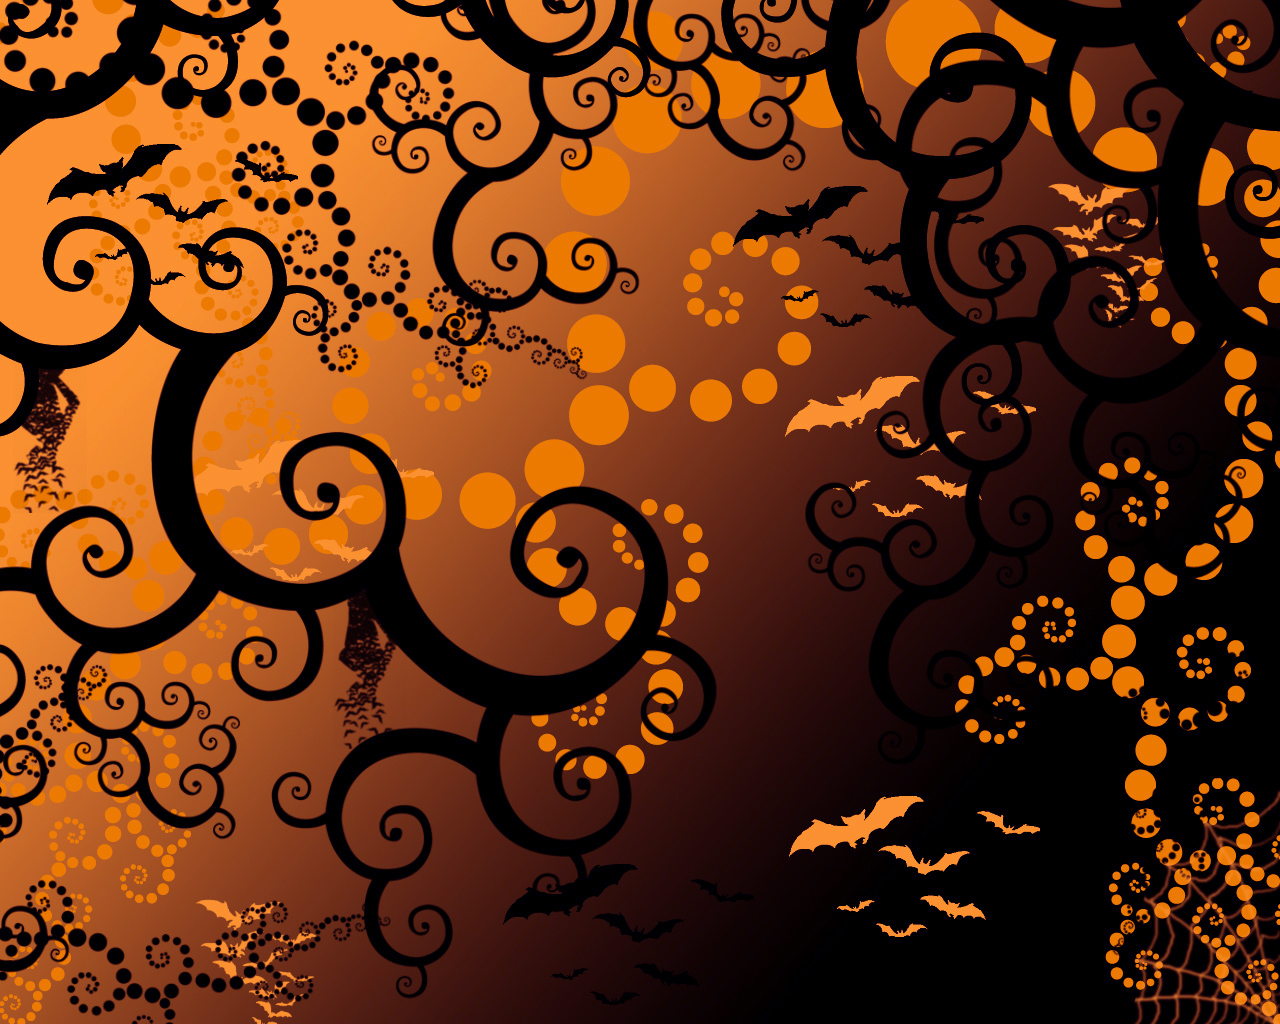 Halloween wallpaper5 1280x1024